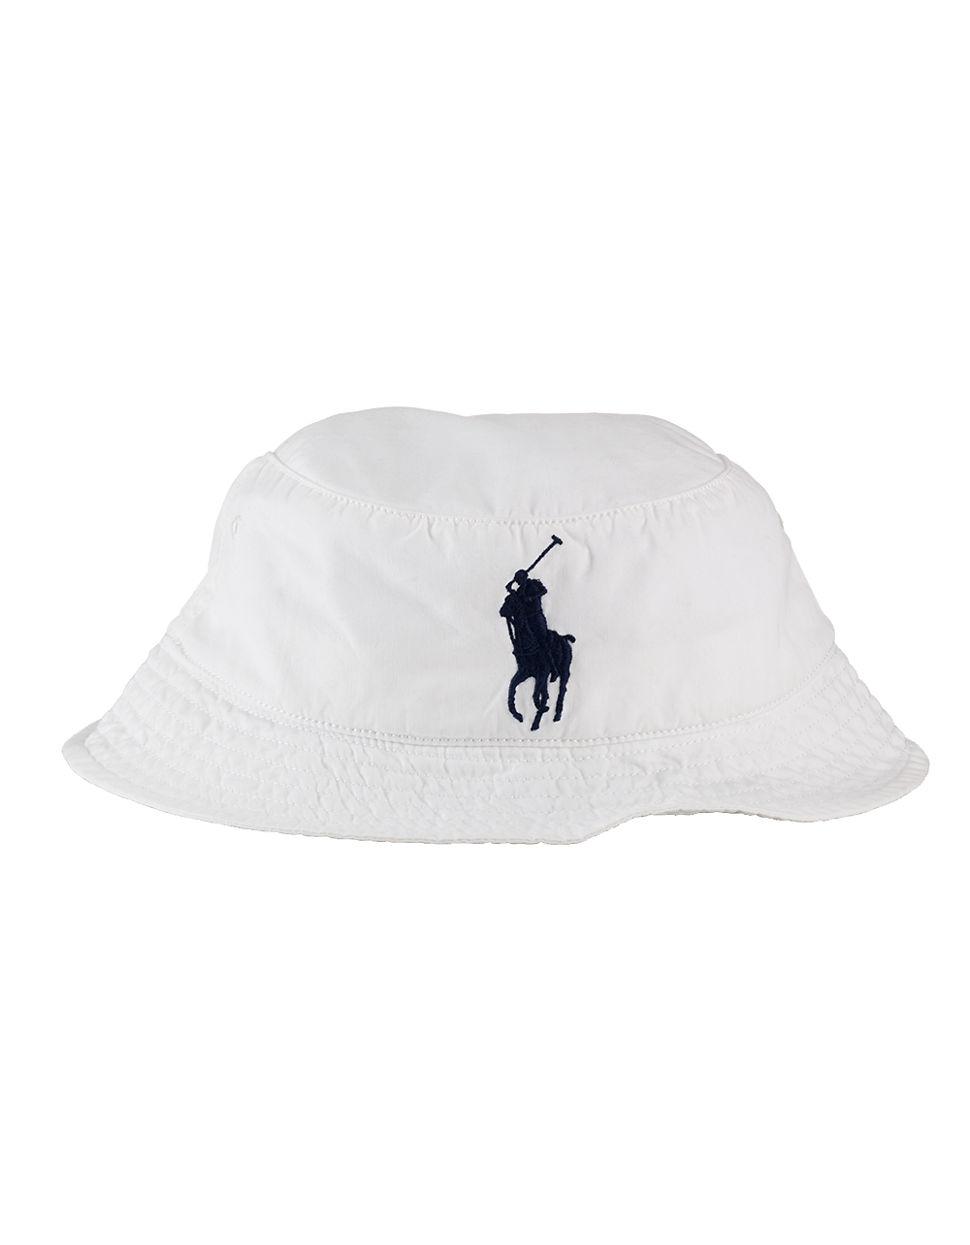 polo ralph lauren beachside bucket hat in white for men lyst